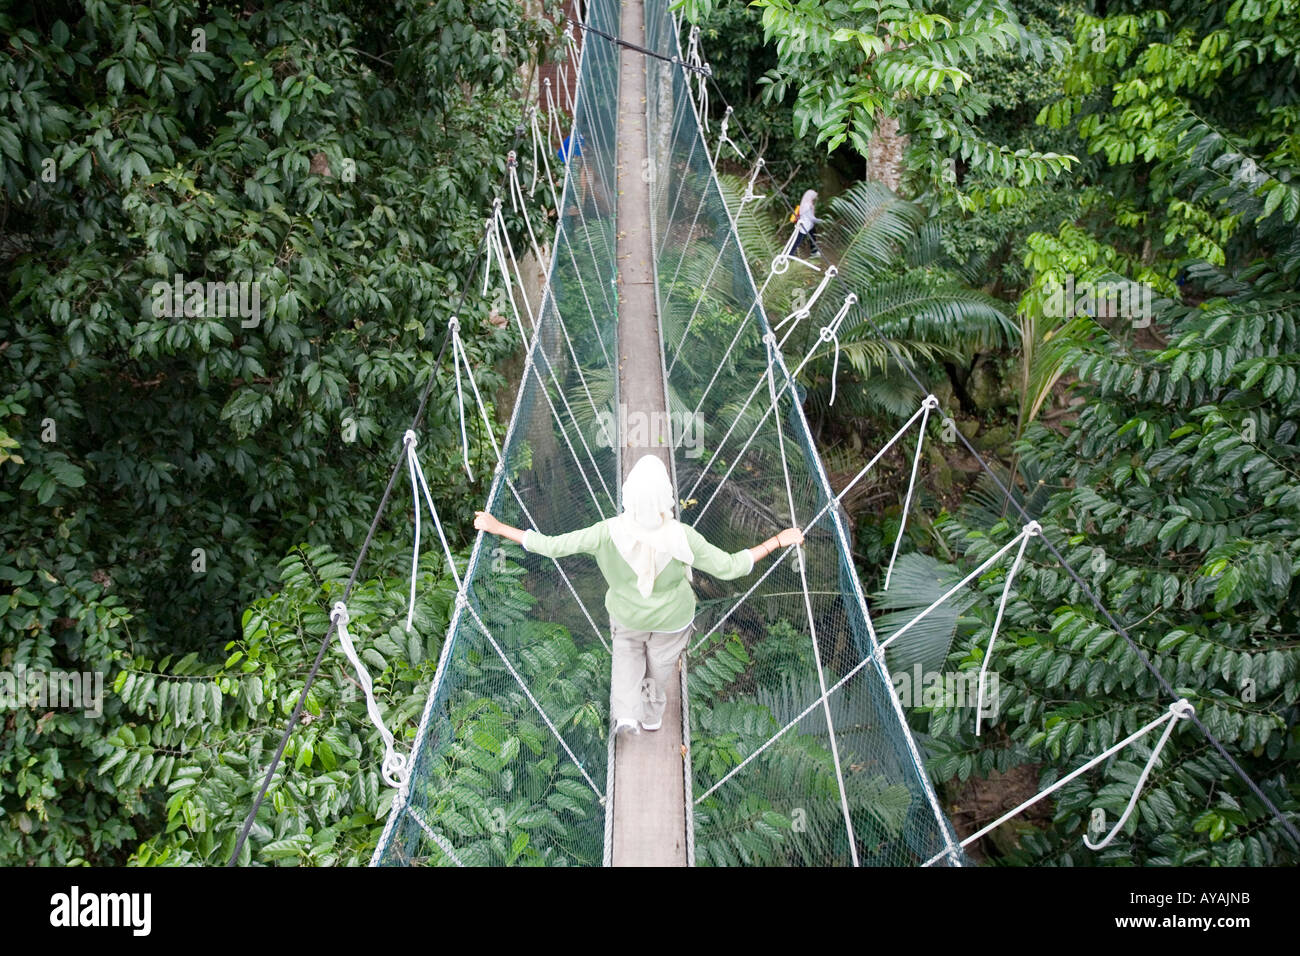 Malaysia Kuala Lumpur Rainforest Canopy Walkway Above Trees And Stock Photo Alamy